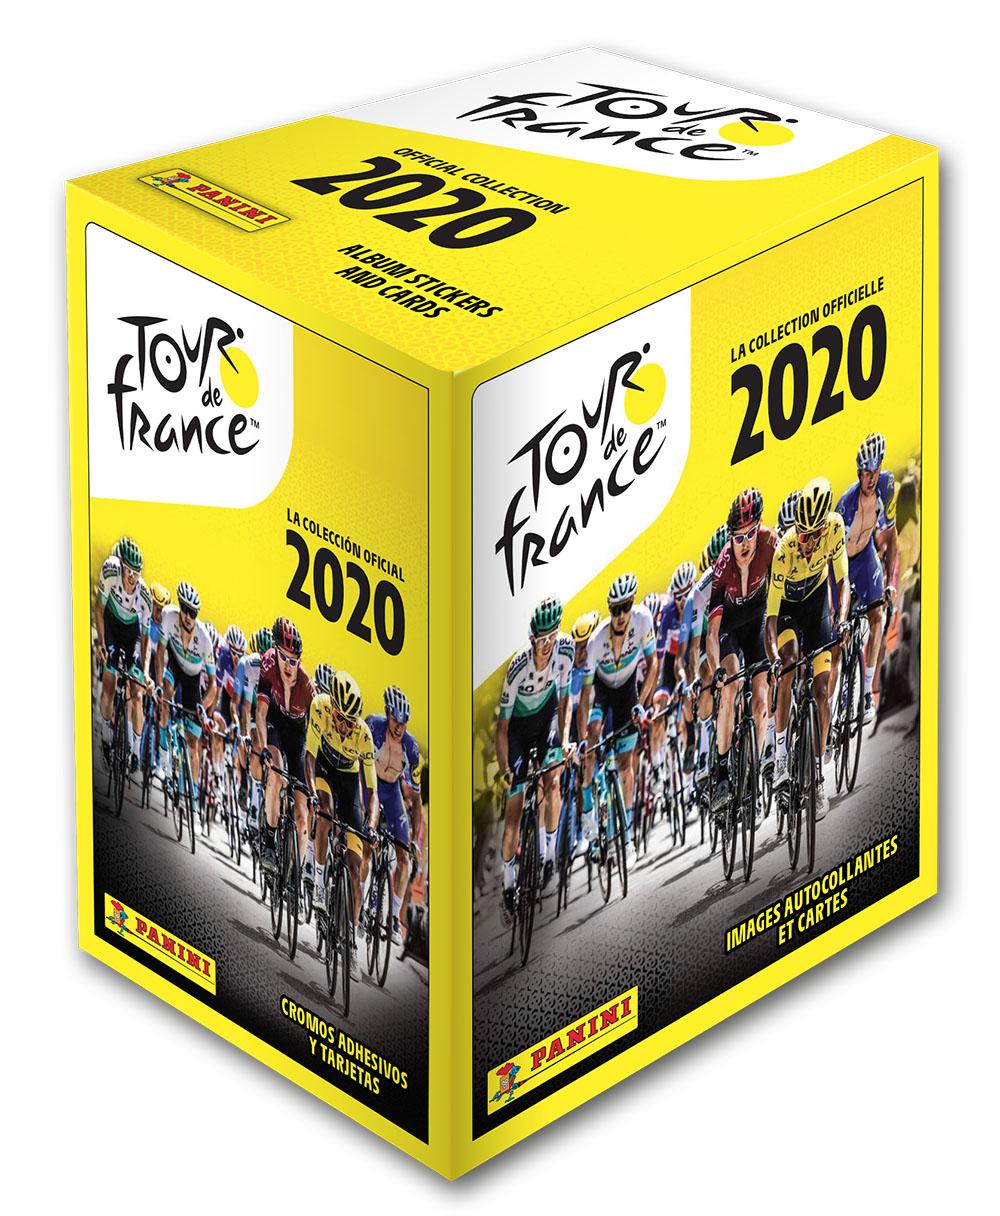 Panini - Tour de France 2020